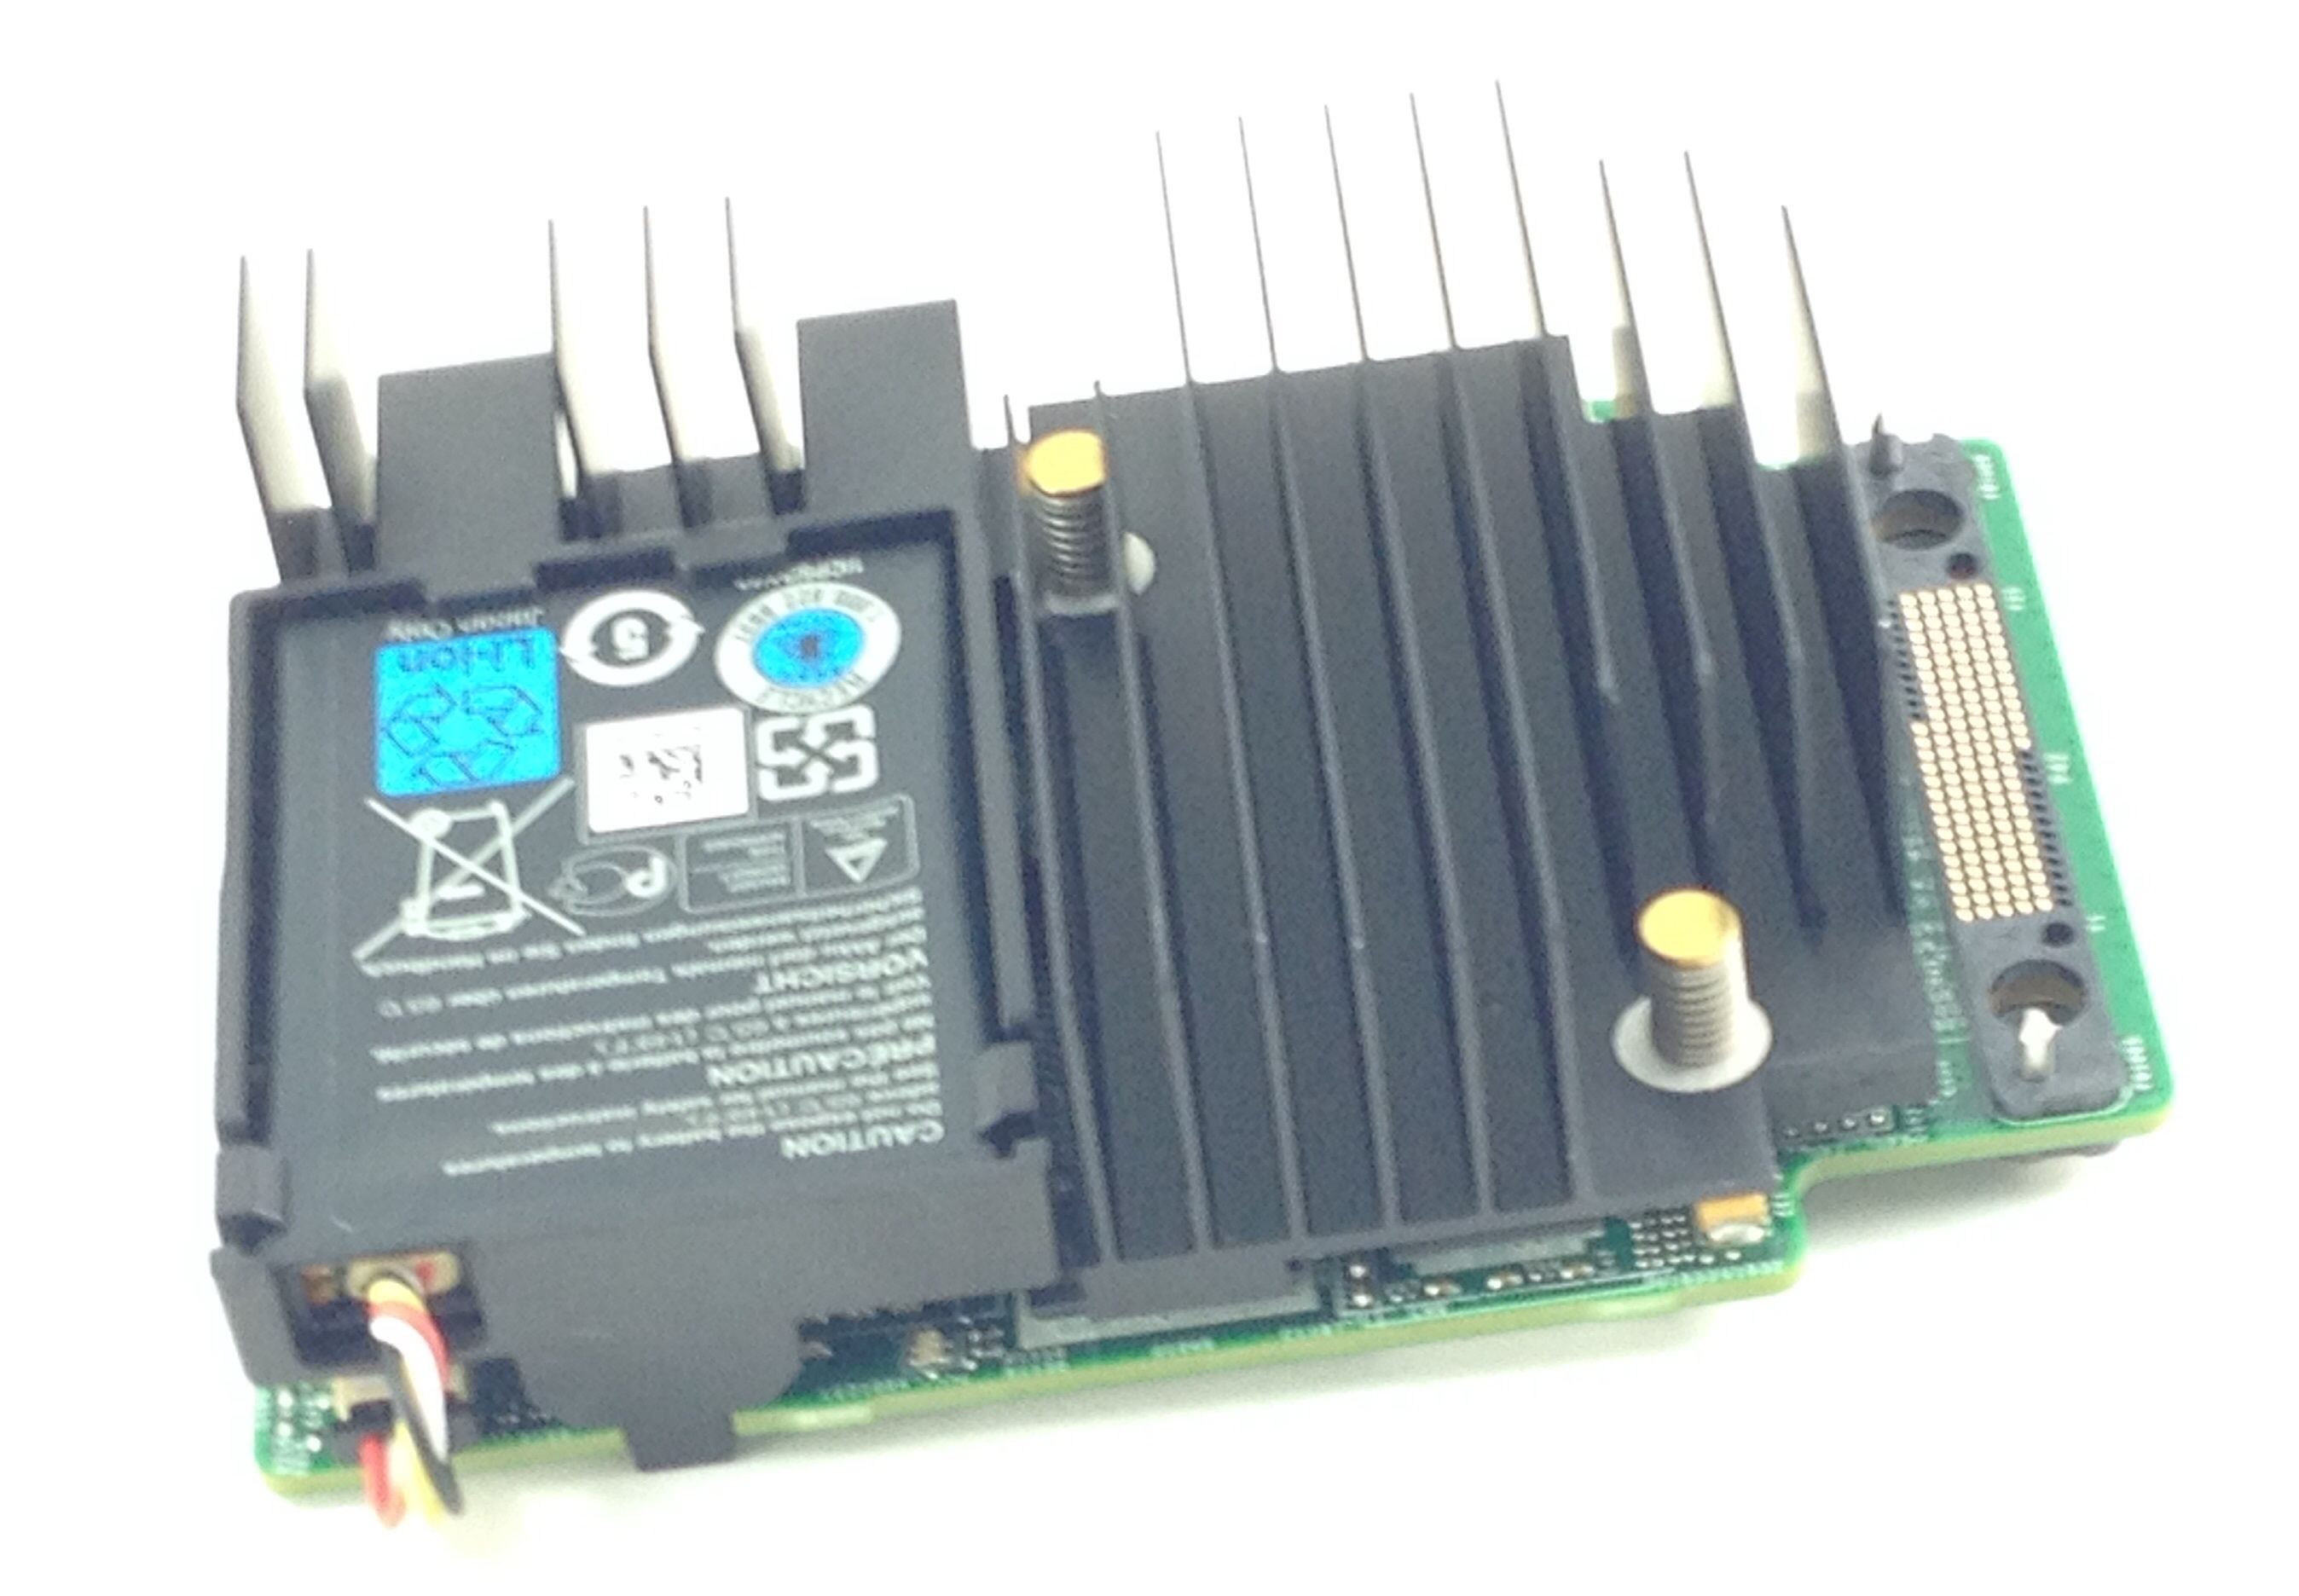 Details about 0kmccd DELL R730XD PERC H730 12GBPS SAS SATA MINI MONO RAID  CONTROLLER